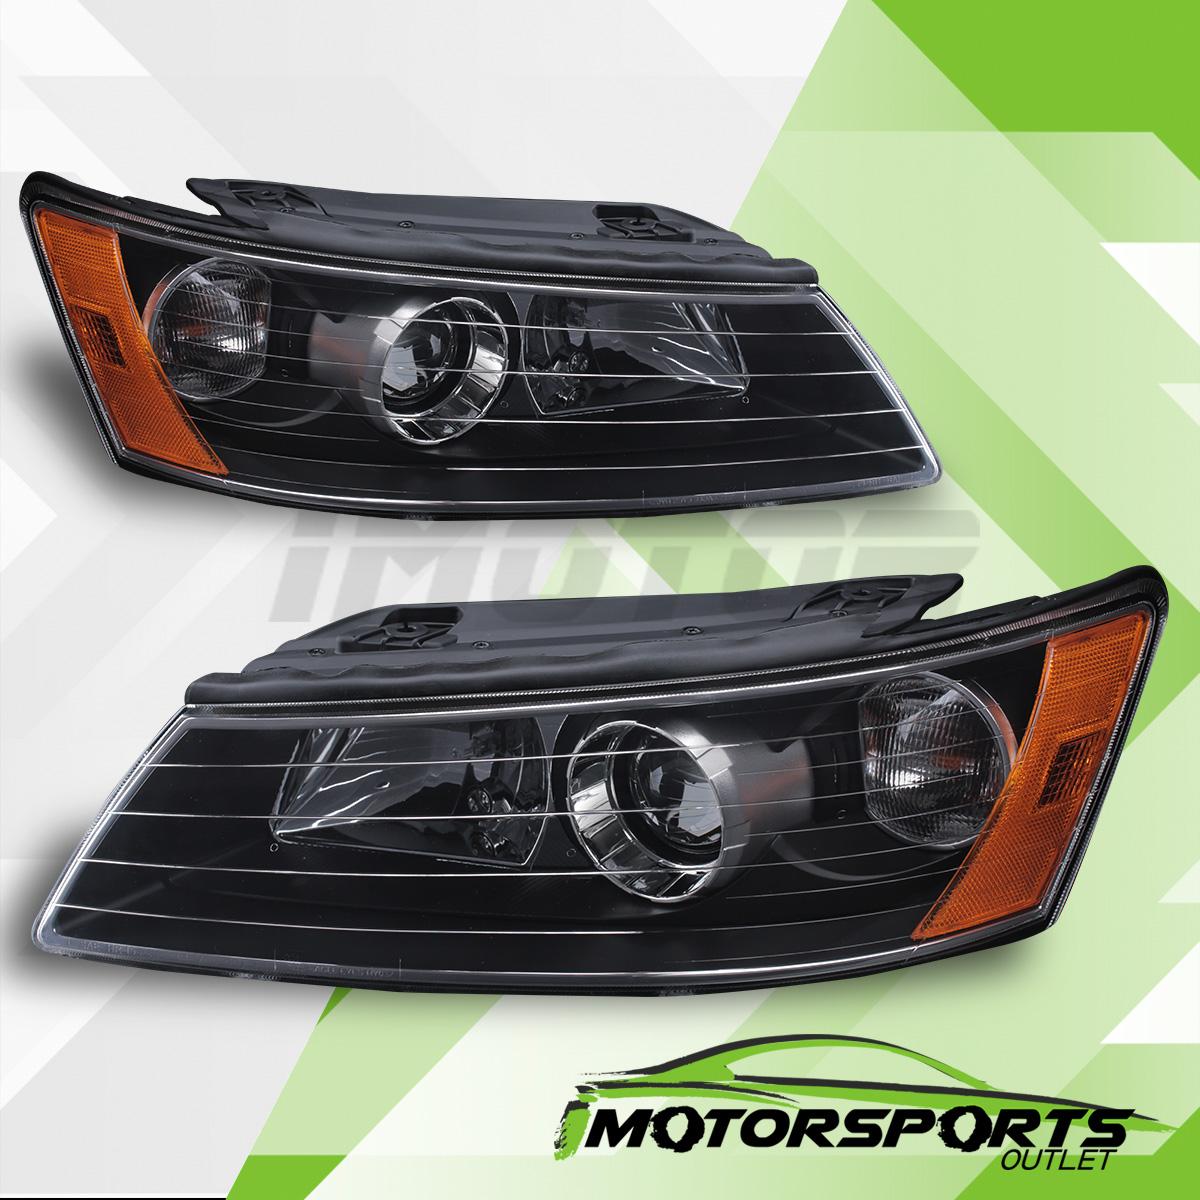 2007 Hyundai Sonata Price: For 2006 2007 2008 Hyundai Sonata Factory Style Black